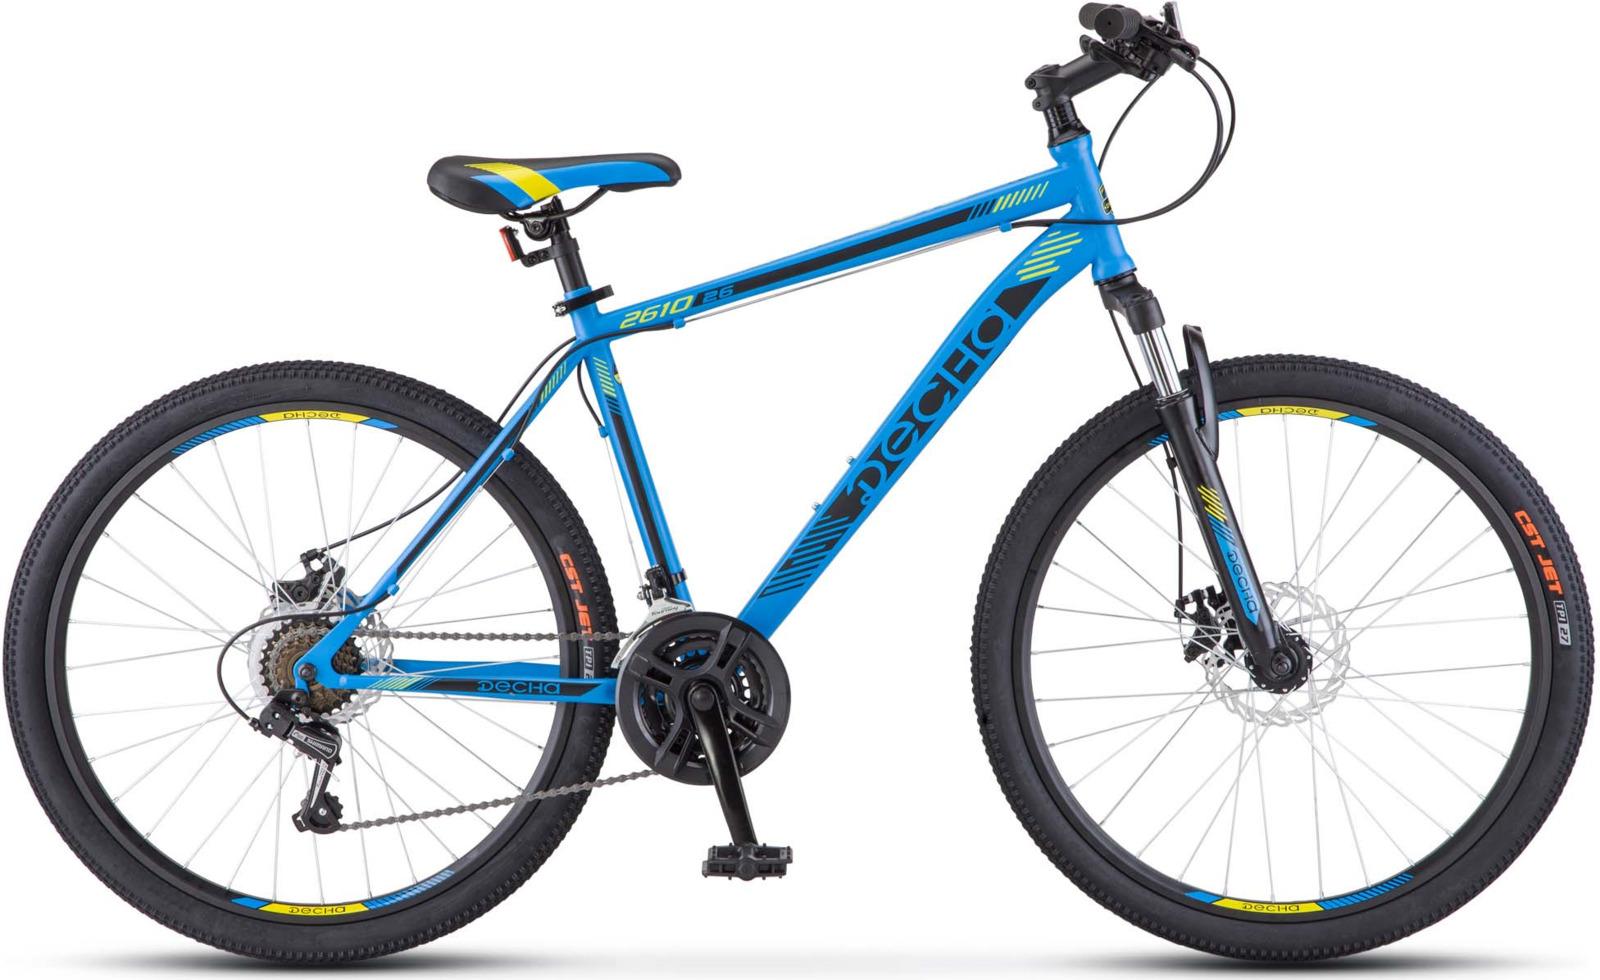 Велосипед Stels Десна-2610 V 26, KUBC0044802017, синий